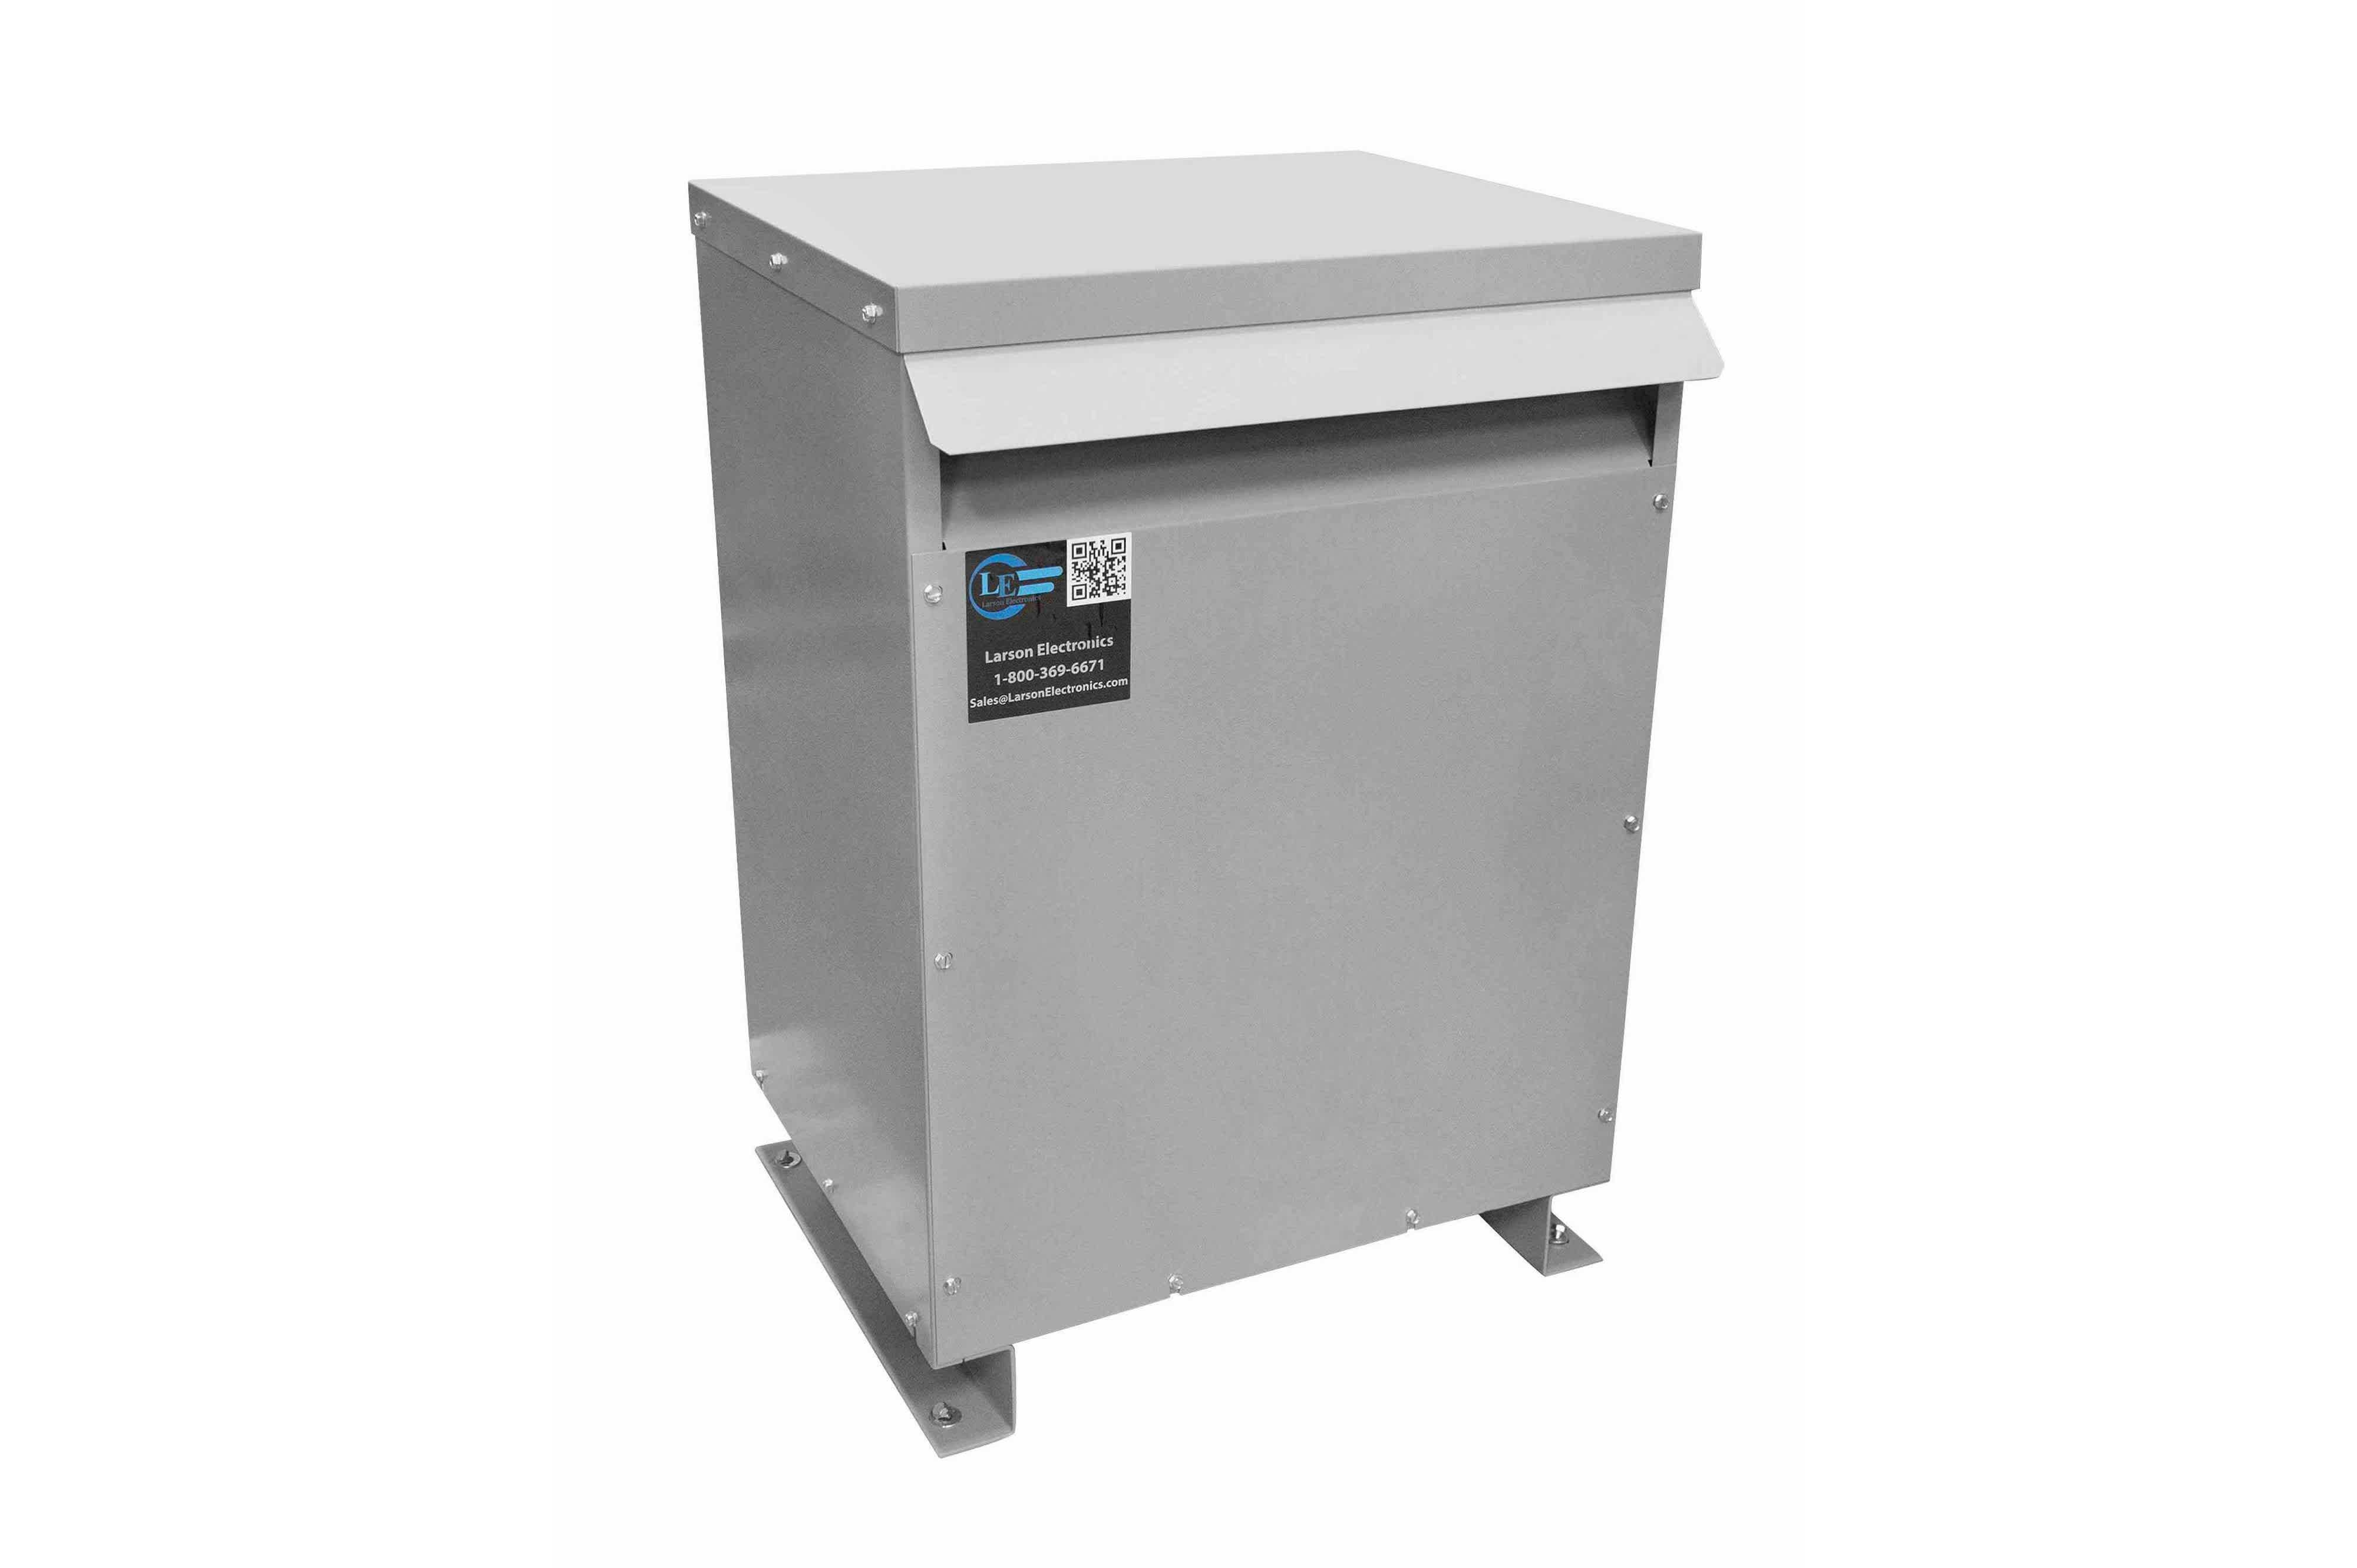 13 kVA 3PH Isolation Transformer, 480V Wye Primary, 480Y/277 Wye-N Secondary, N3R, Ventilated, 60 Hz